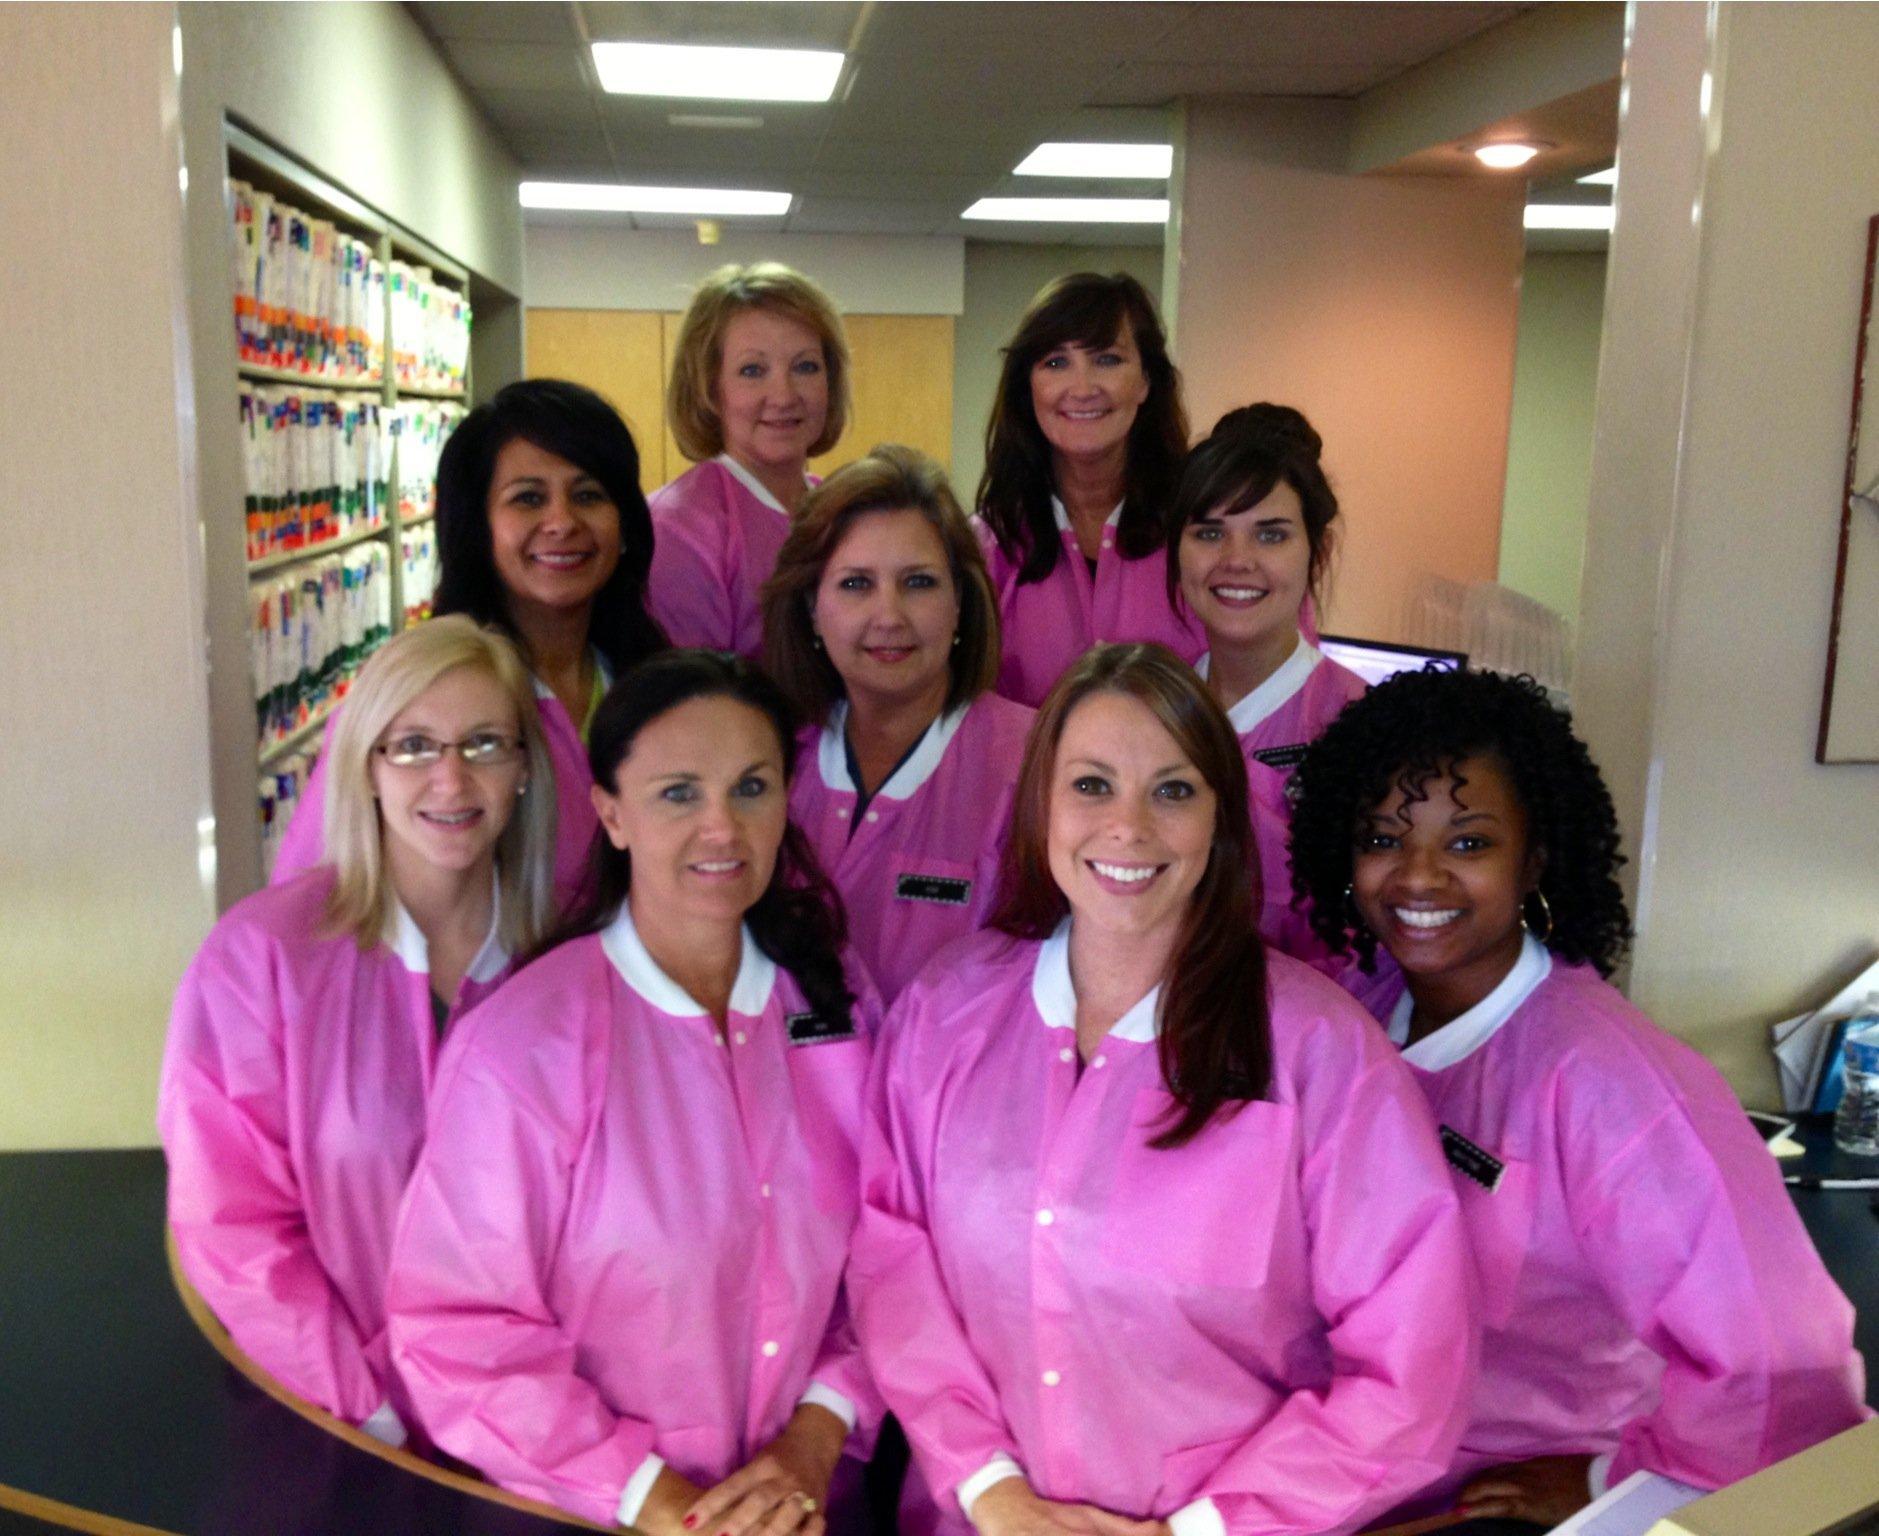 North Mississippi Orthodontic Associates Pa image 2